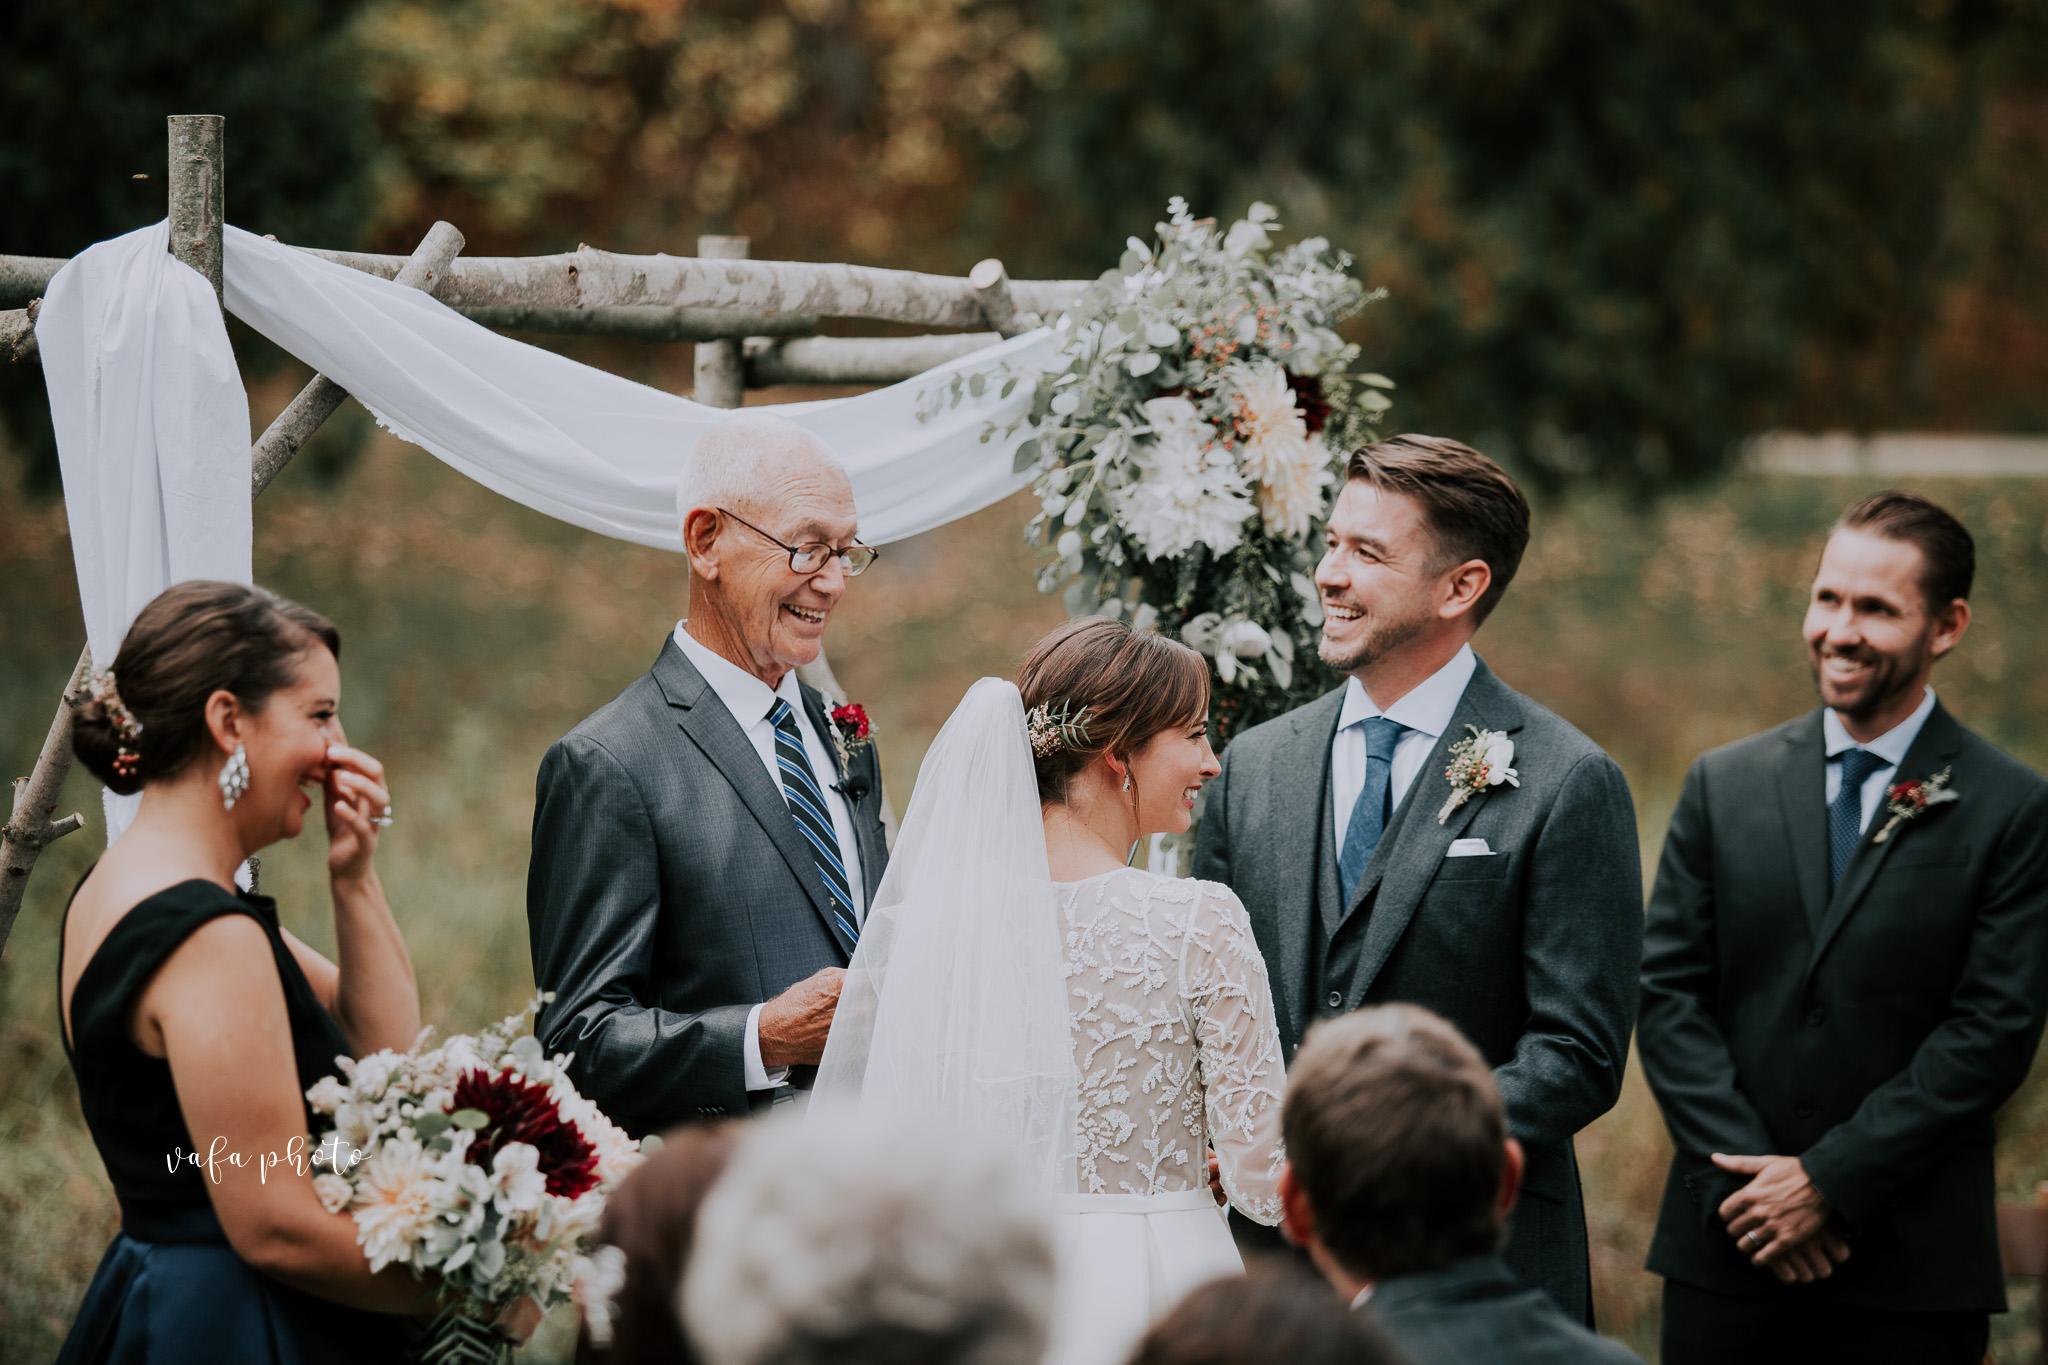 Grand-Rapids-Wedding-Danielle-Brian-Vafa-Photo-677.jpg